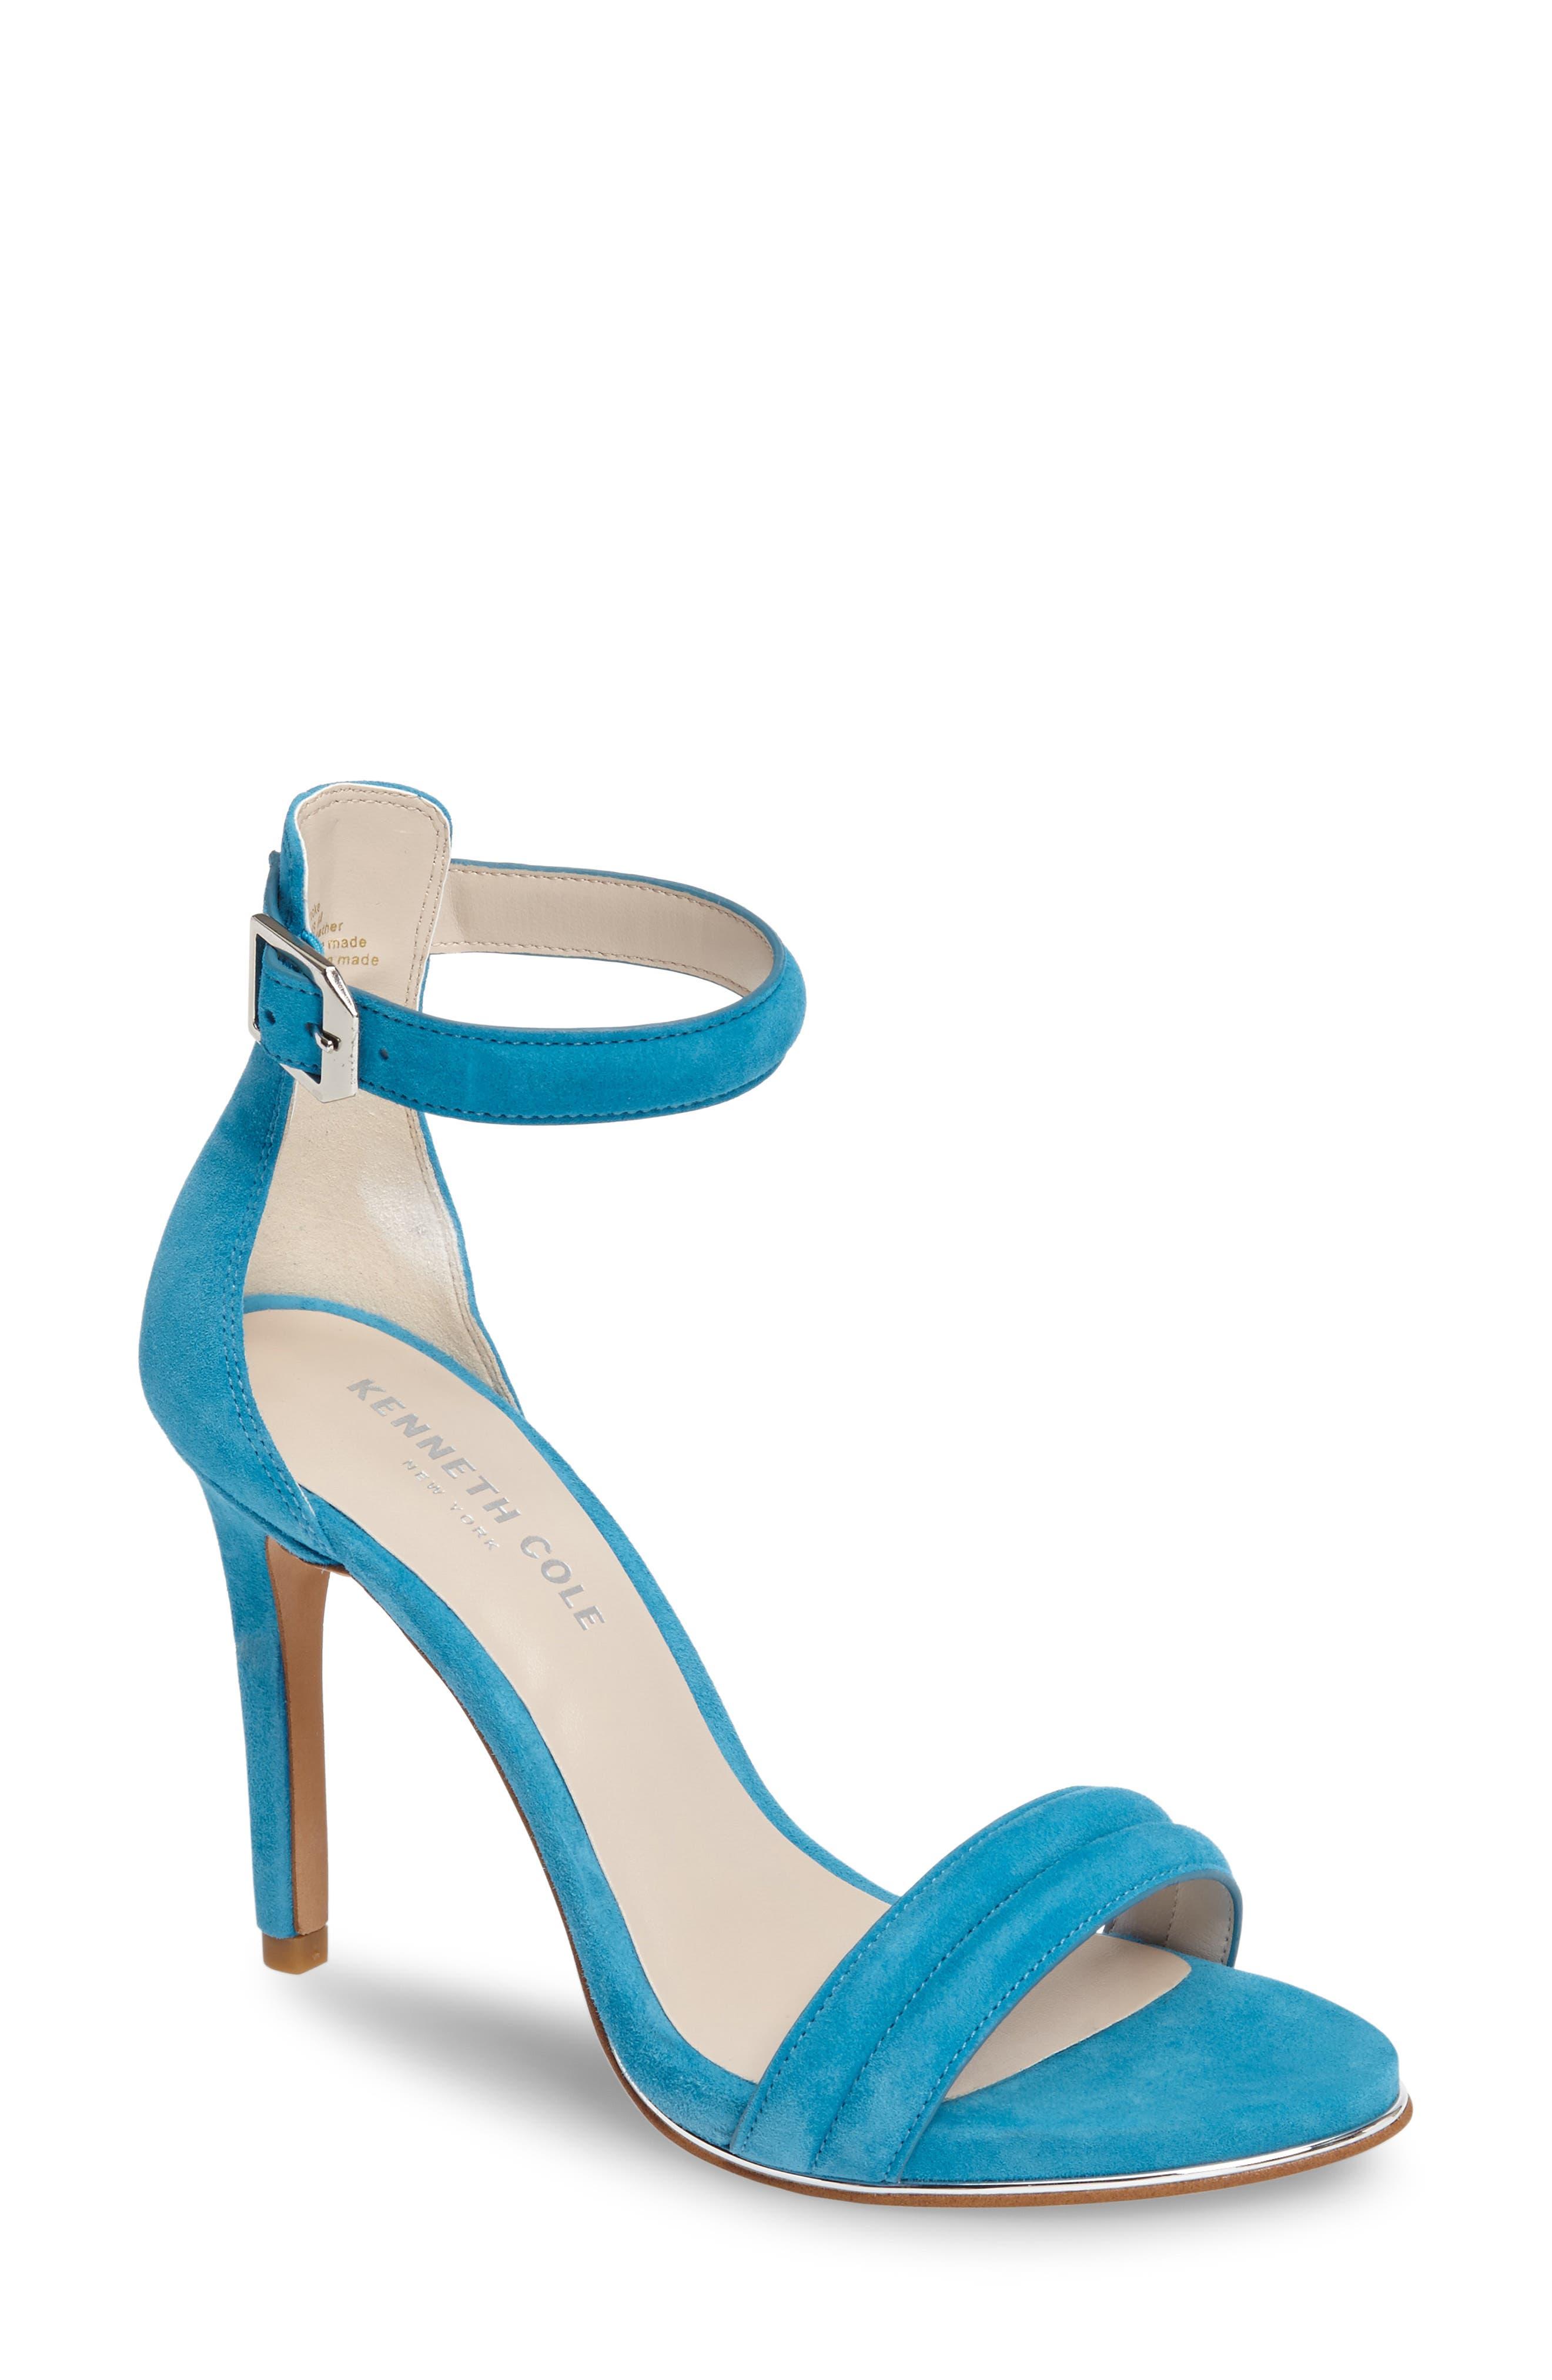 Alternate Image 1 Selected - Kenneth Cole New York 'Brooke' Ankle Strap Sandal (Women)